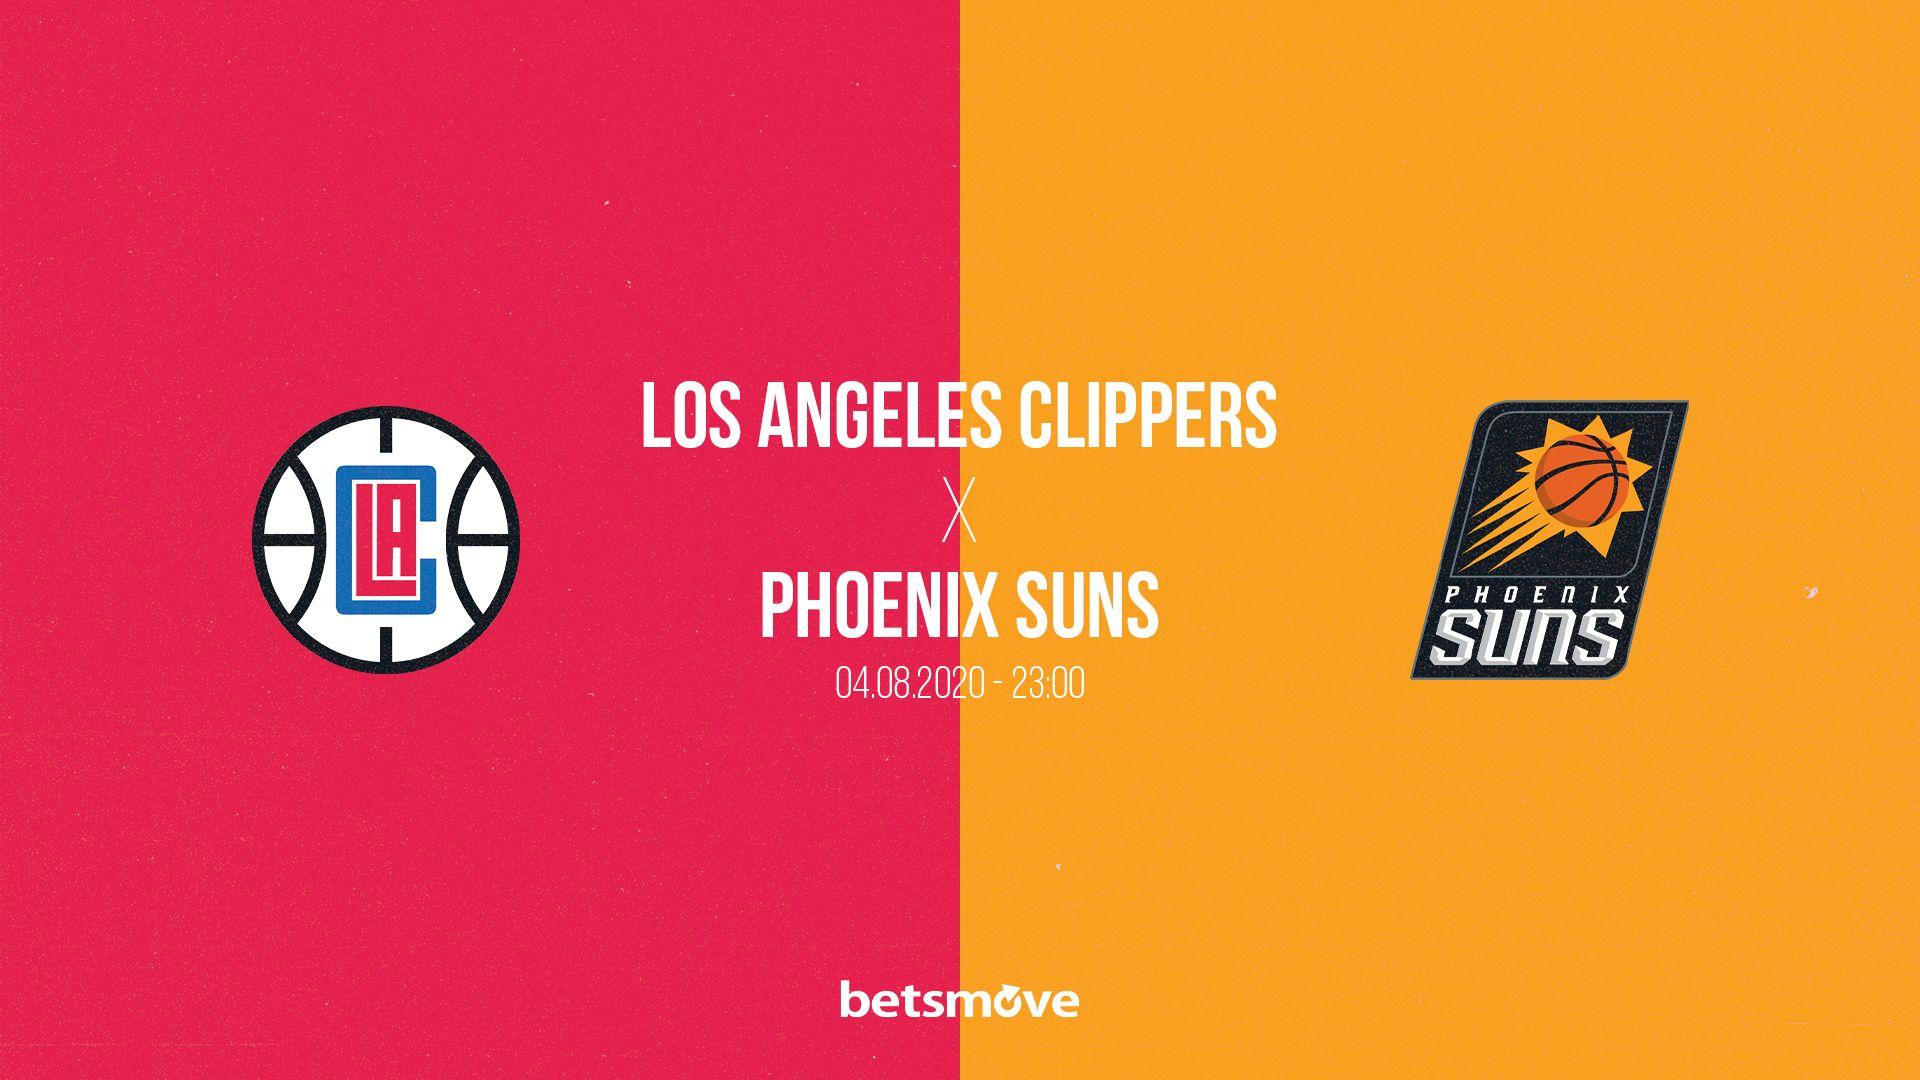 Los Angeles Clippers Phoenix Suns Canli Izle 2020 Mac Izleme Tv